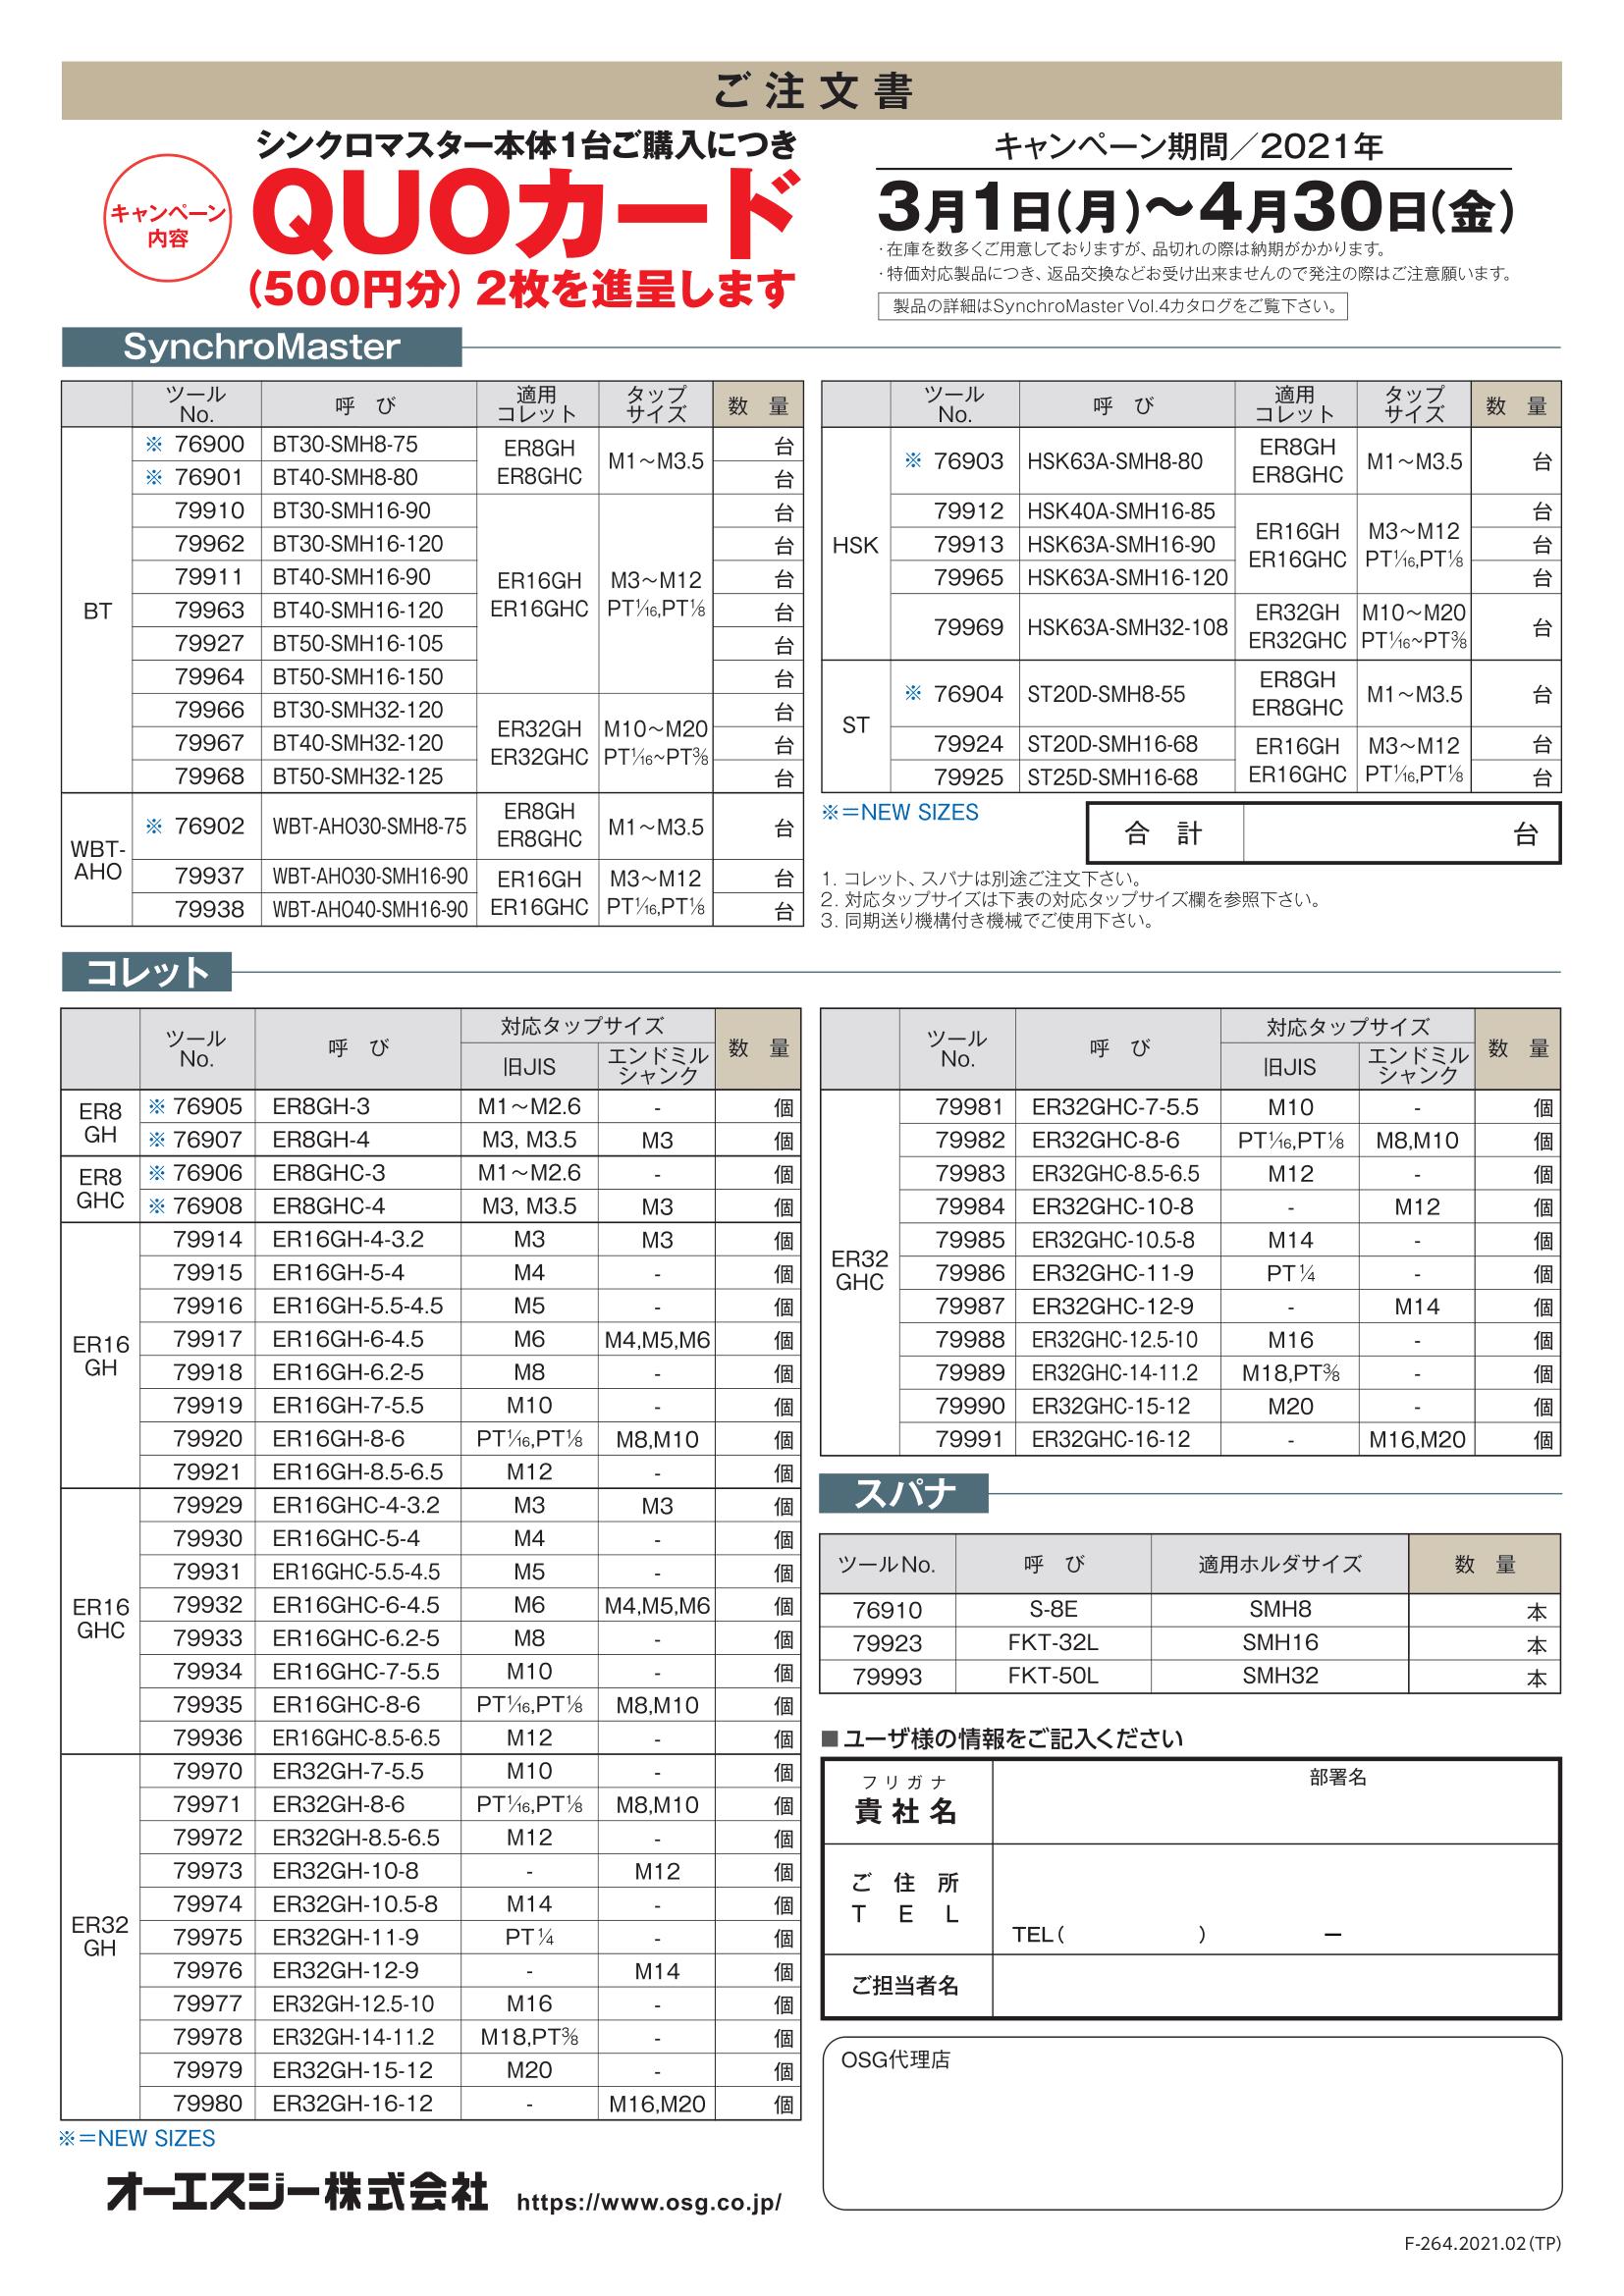 F-264_SynchroMaster_2